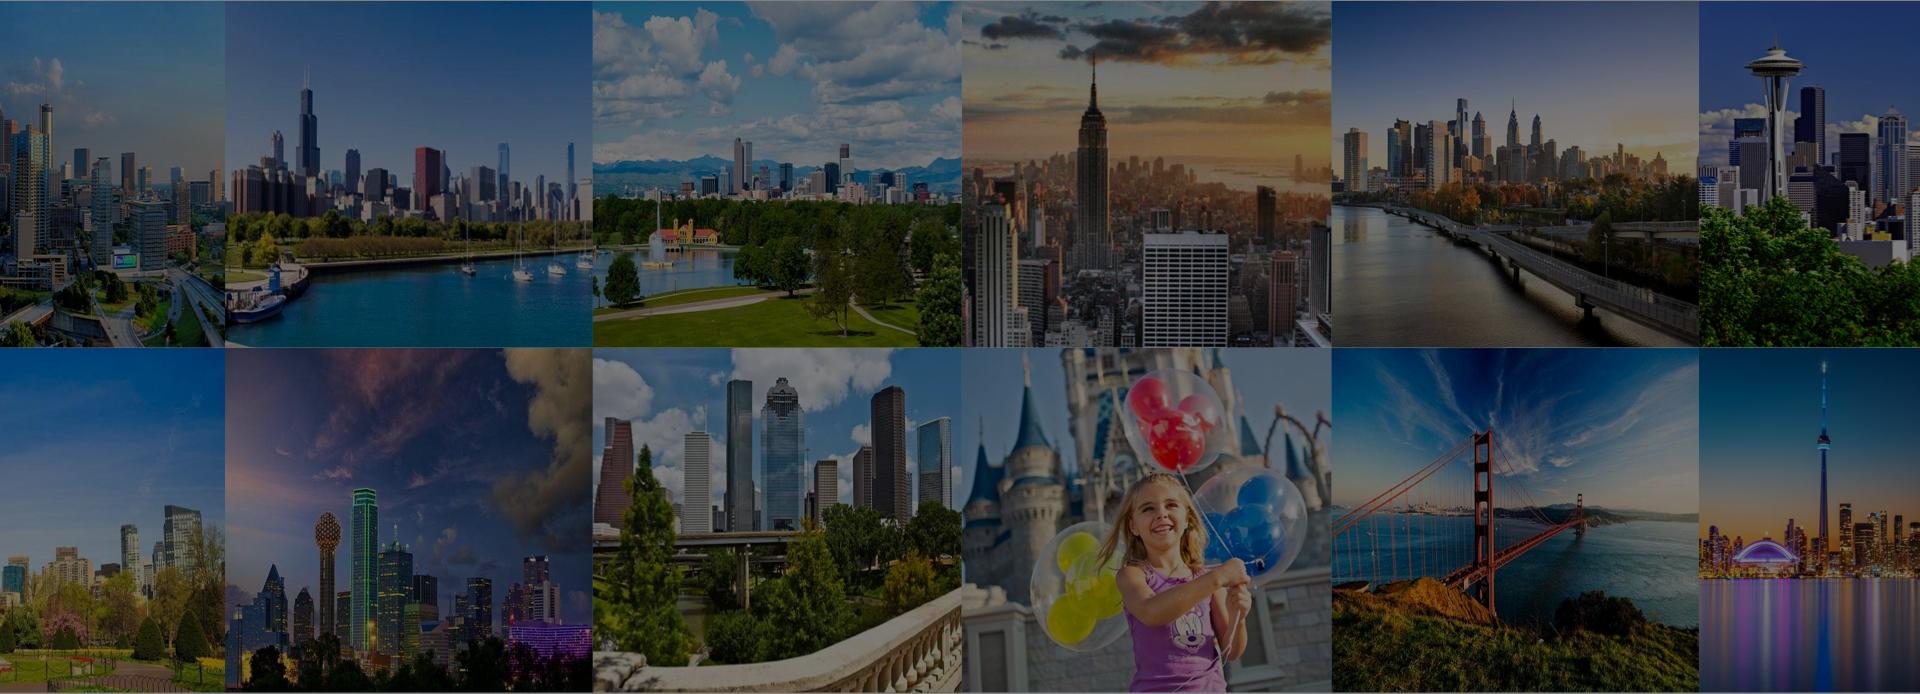 citypass-mediaroom-hero